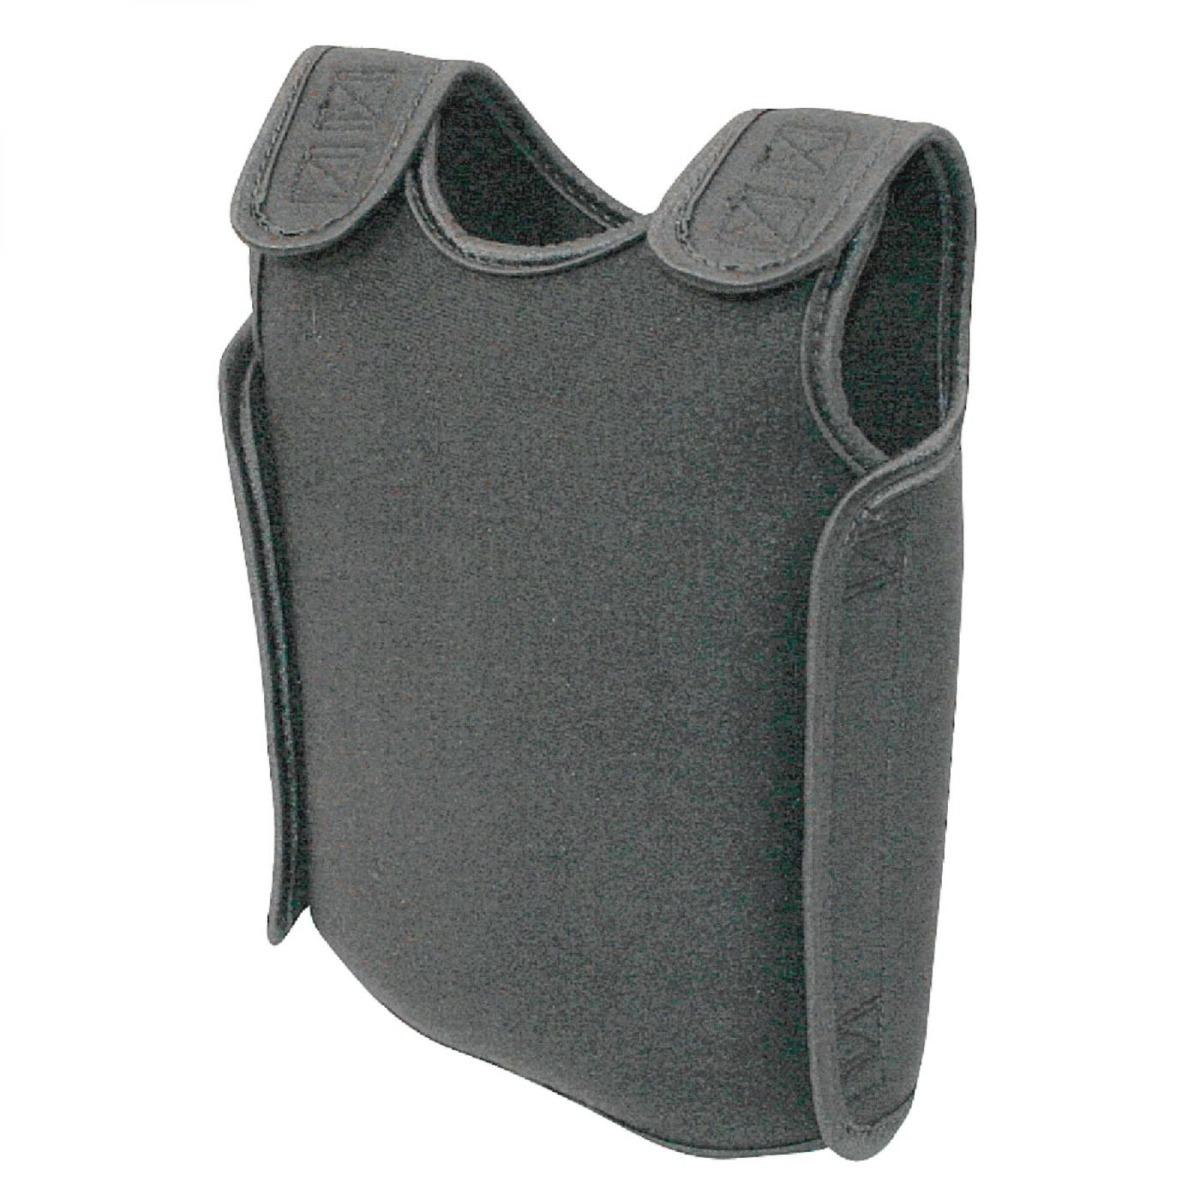 Sensory Cuff and Pressure Vest